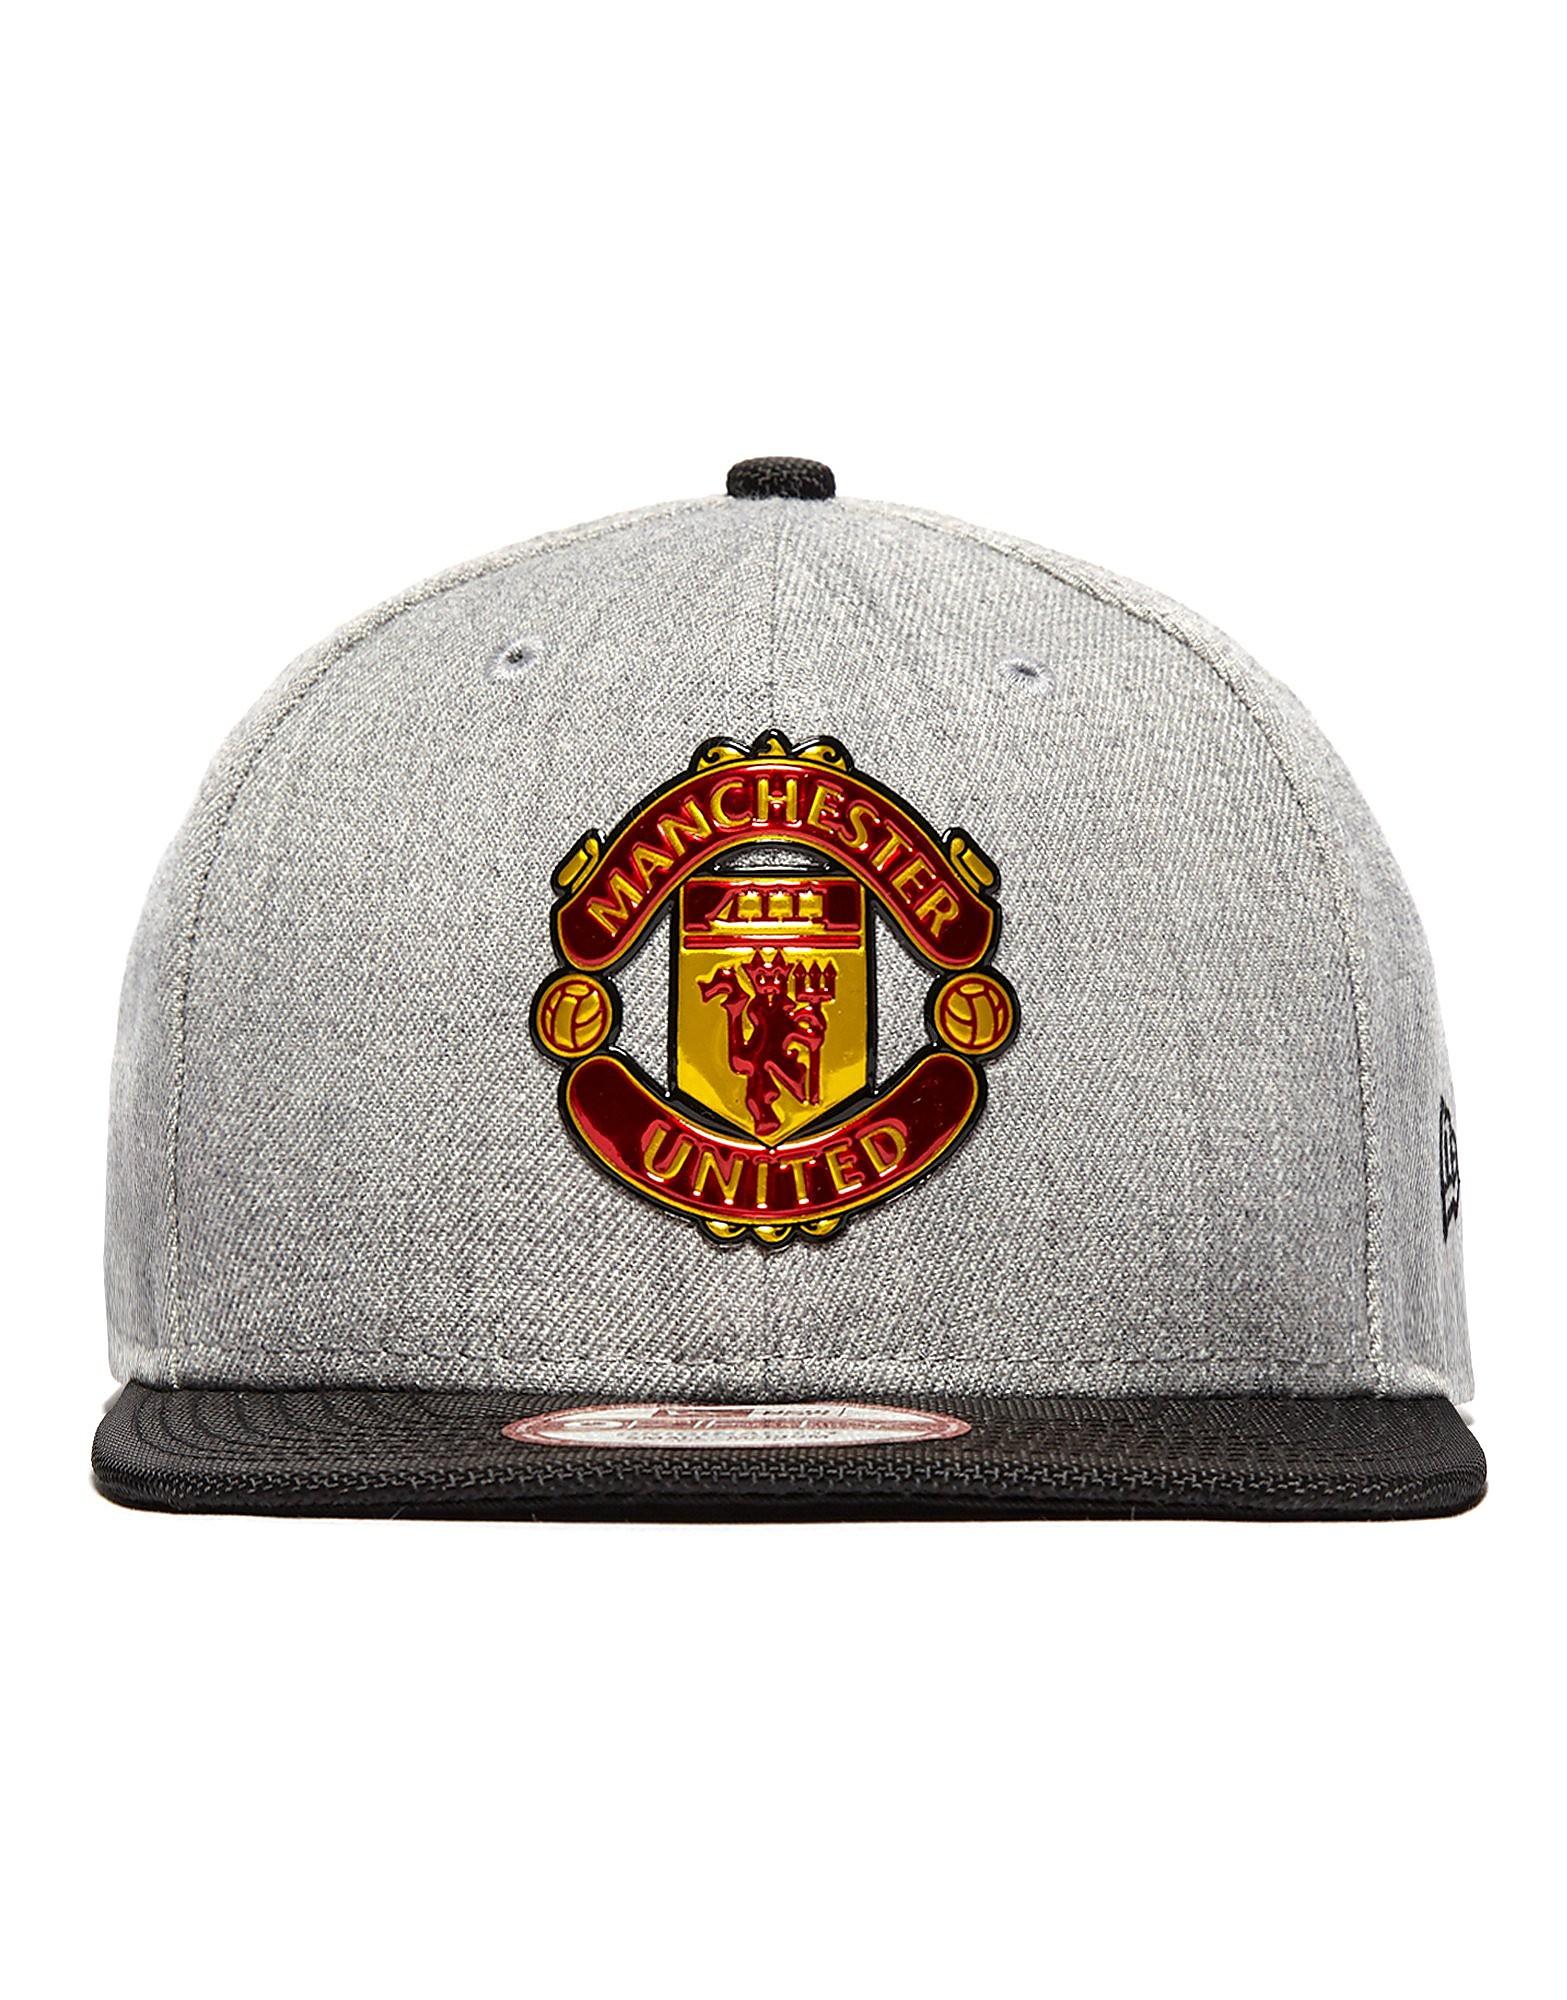 New Era Manchester United 9FIFTY Ballistic Snapback Cap